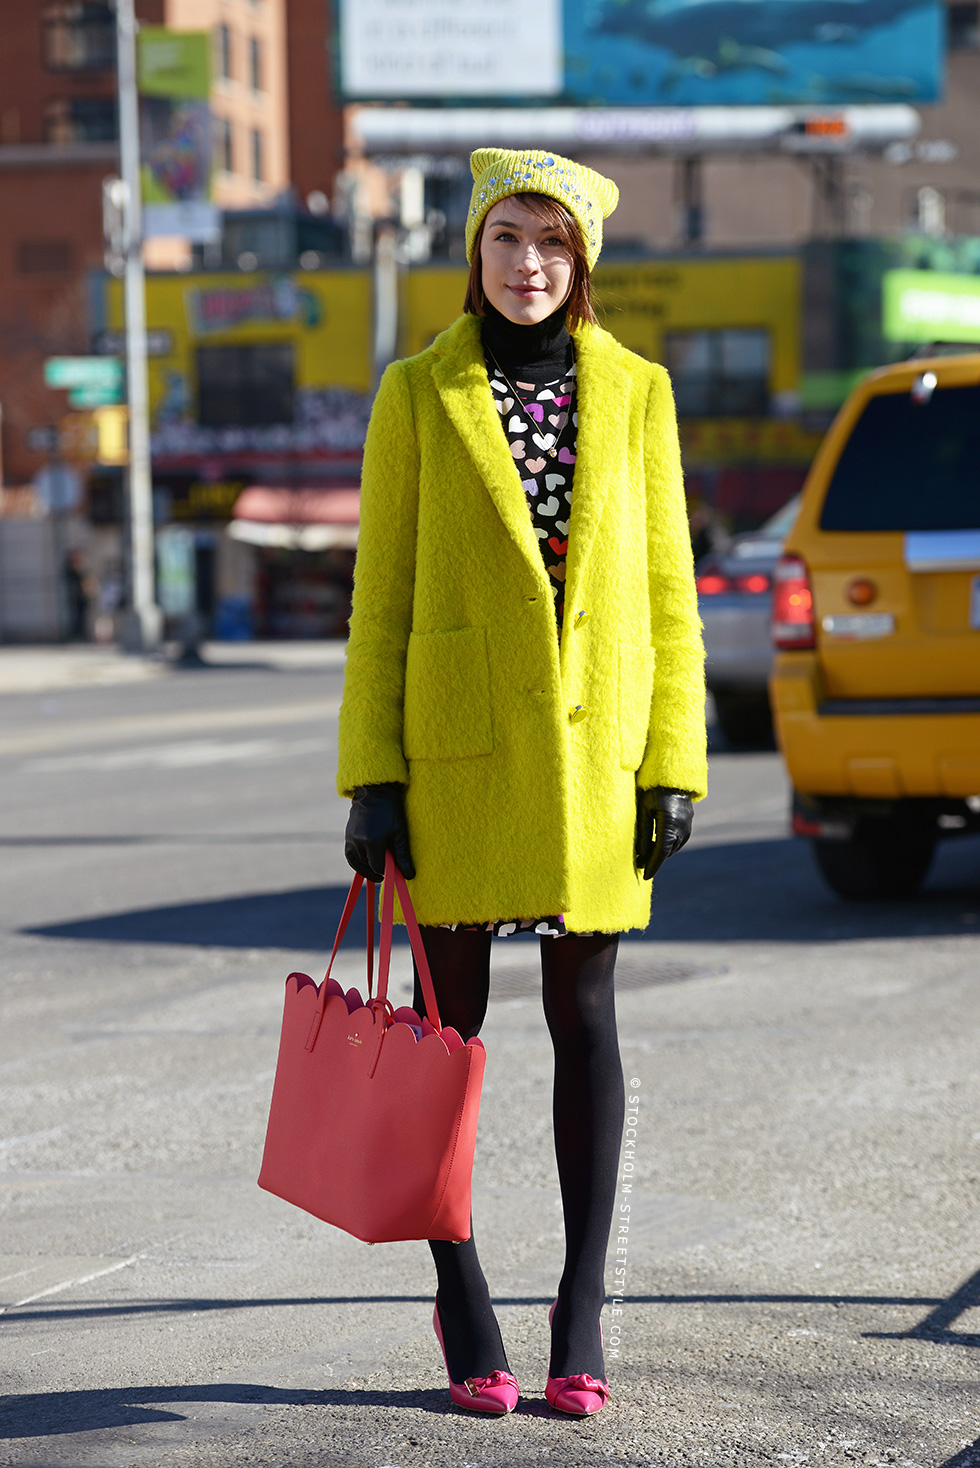 stockholm-streetstyle-fashionjazz.16